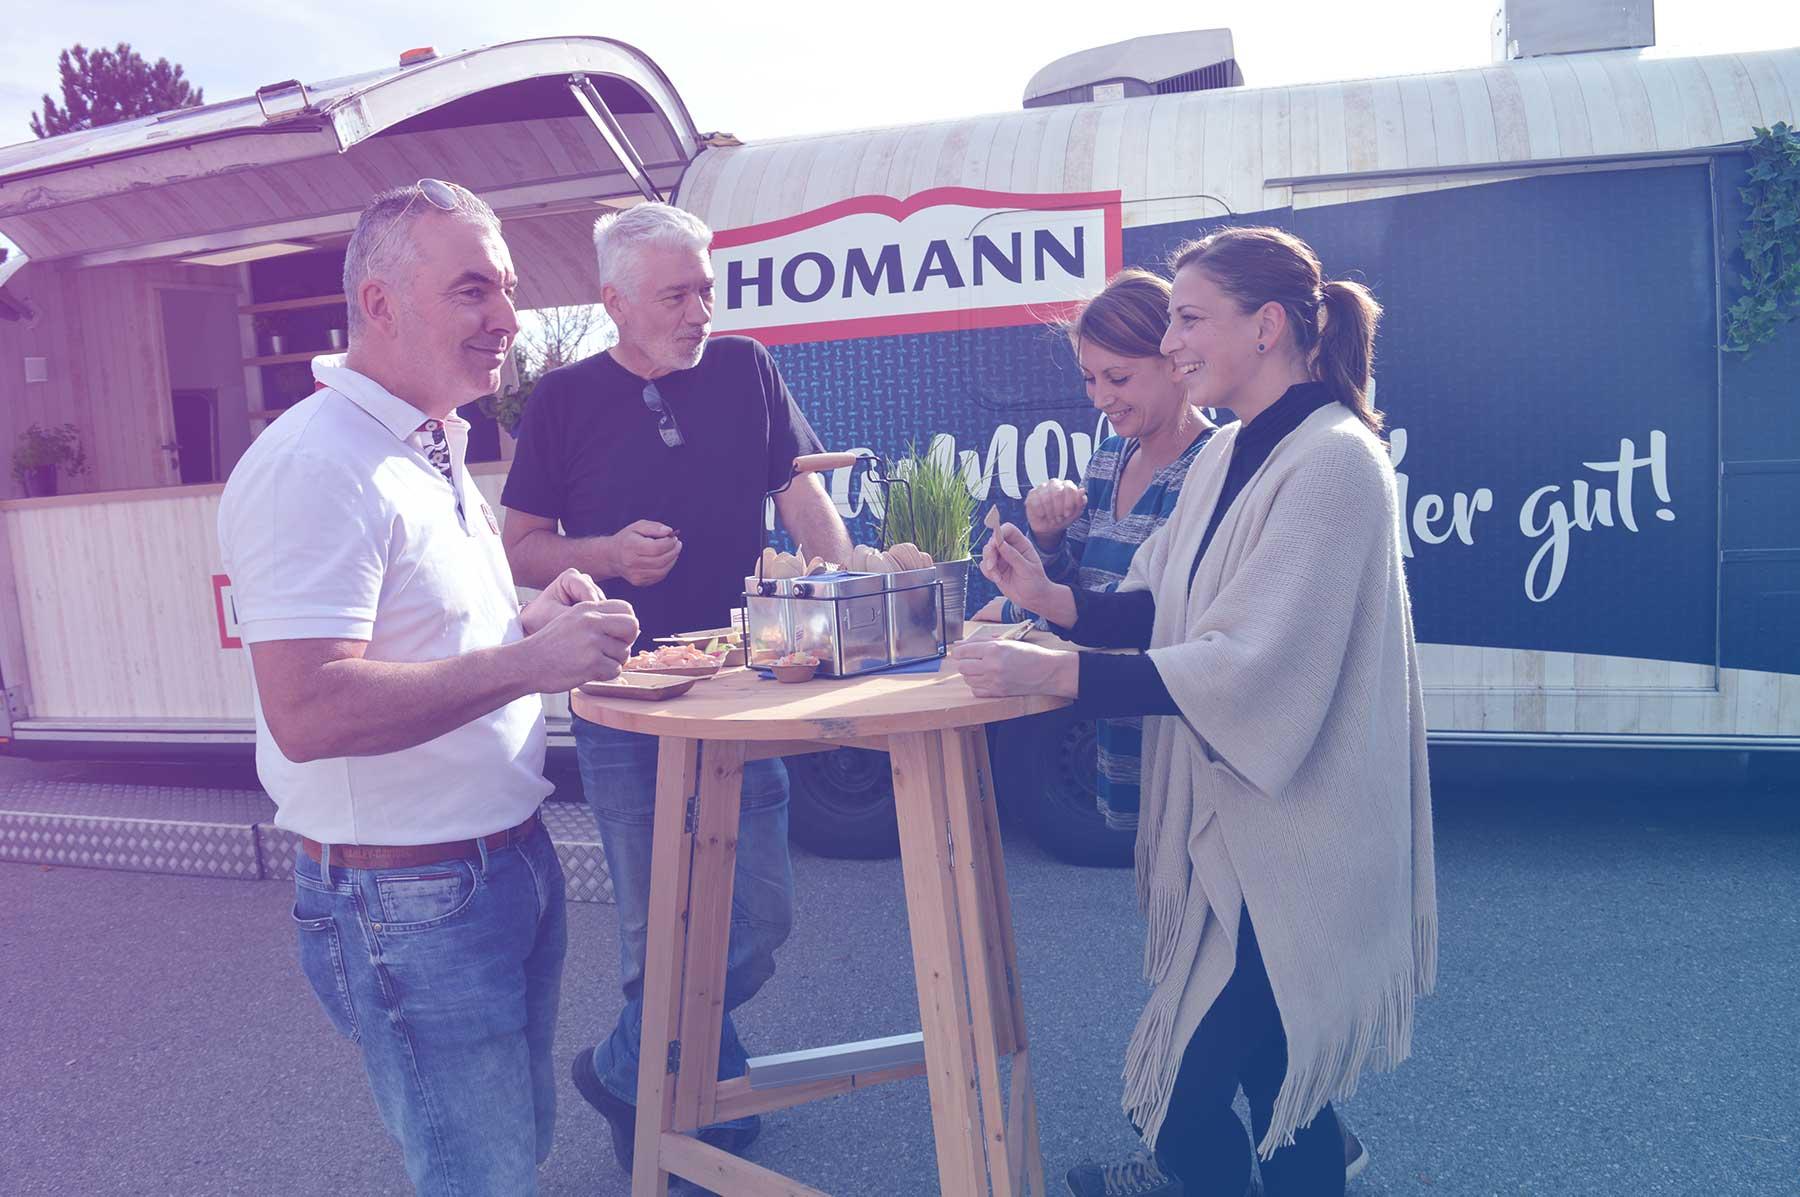 Homann_Roadshow_People_Filter_1800x1197